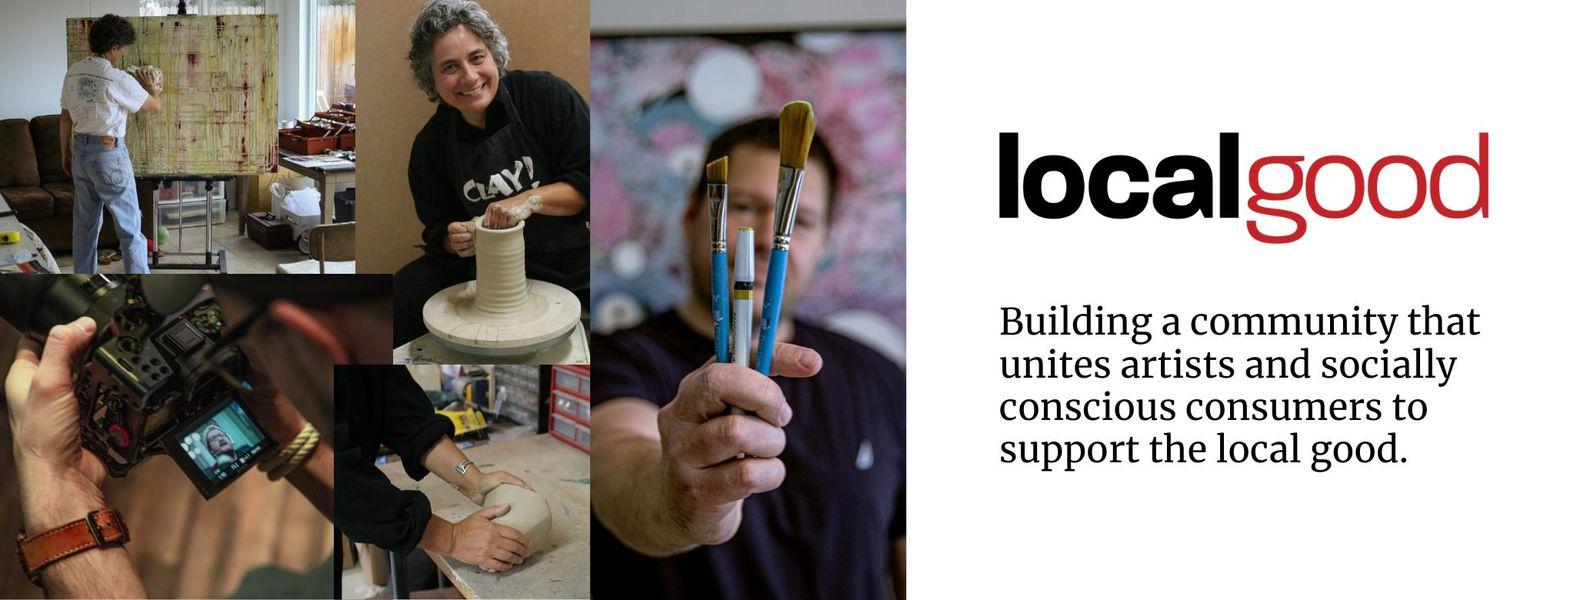 LocalGood – Ecommerce platform for artists